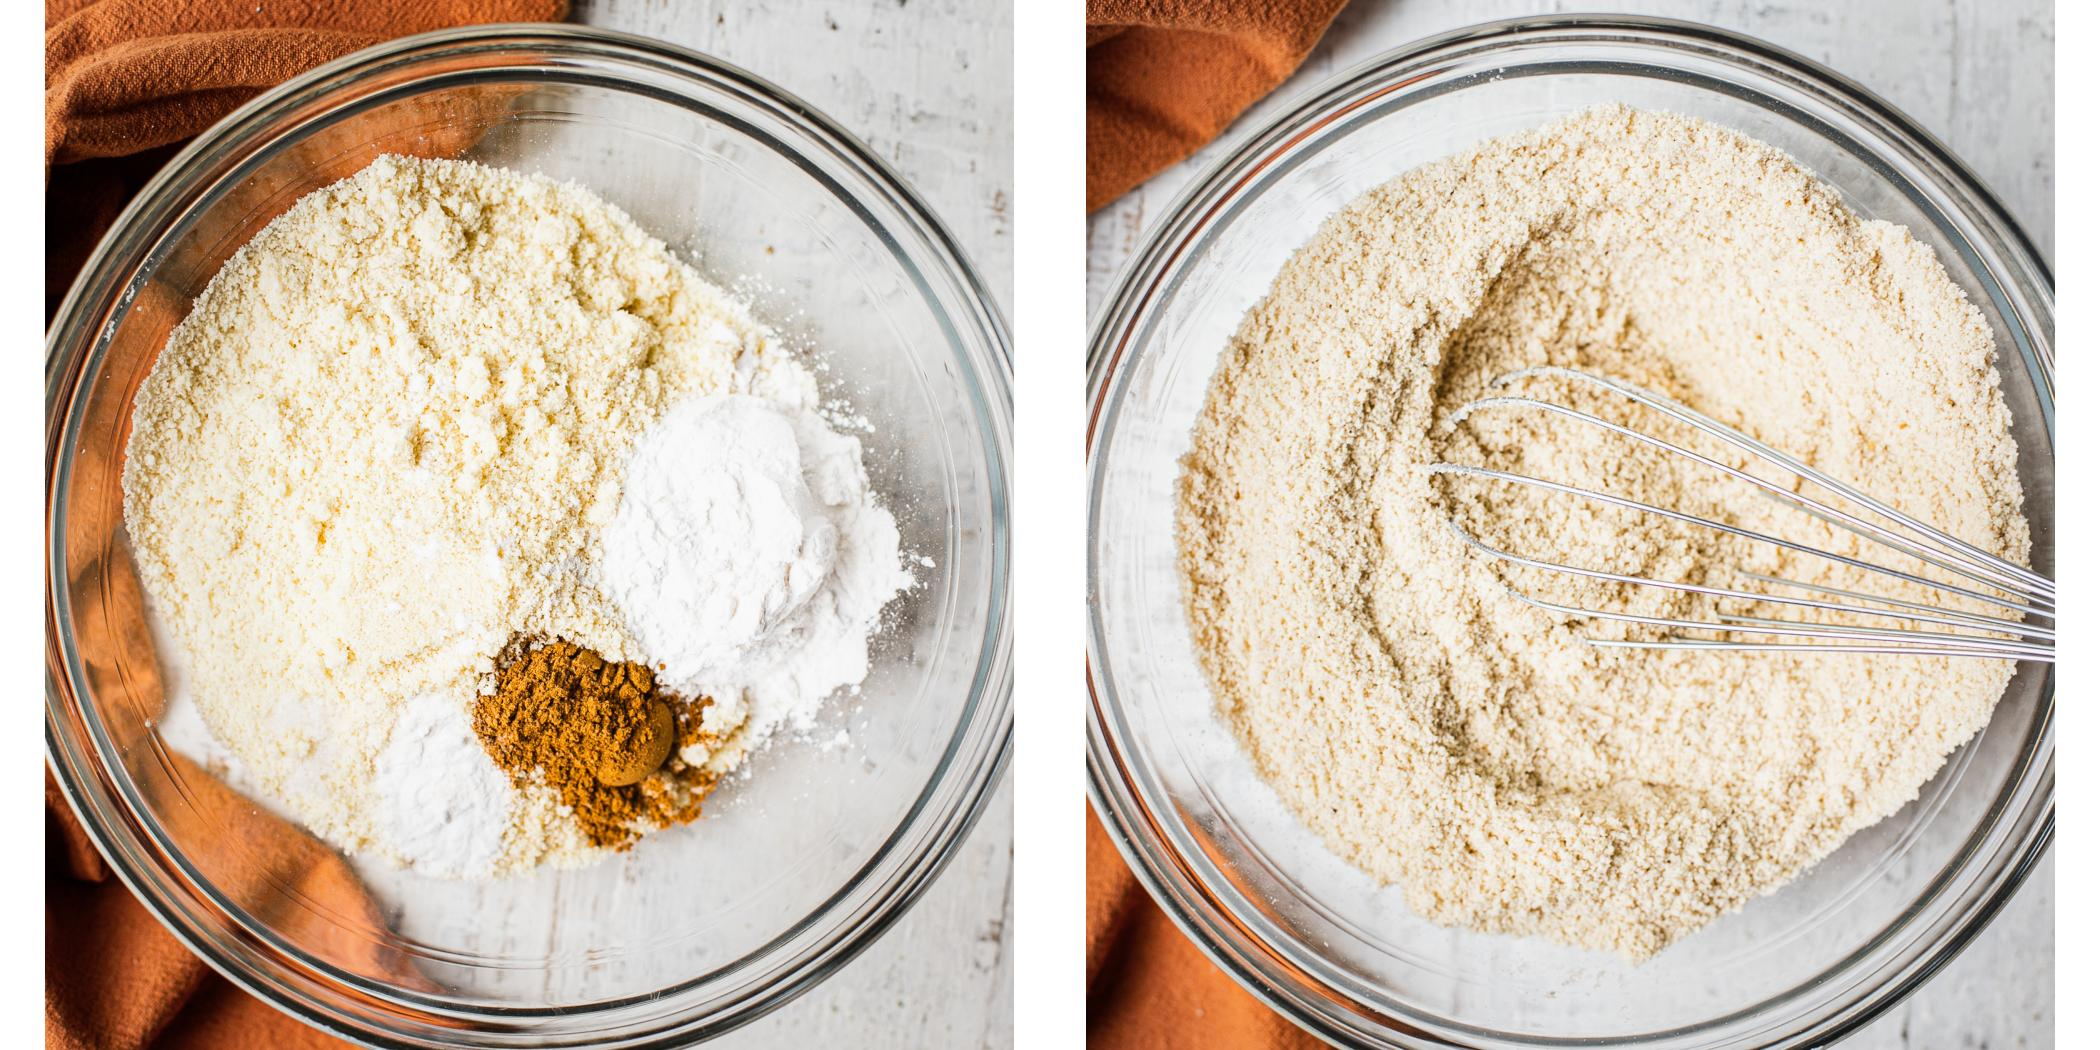 Almond flour, salt, tapioca flour, and baking soda being mixed together